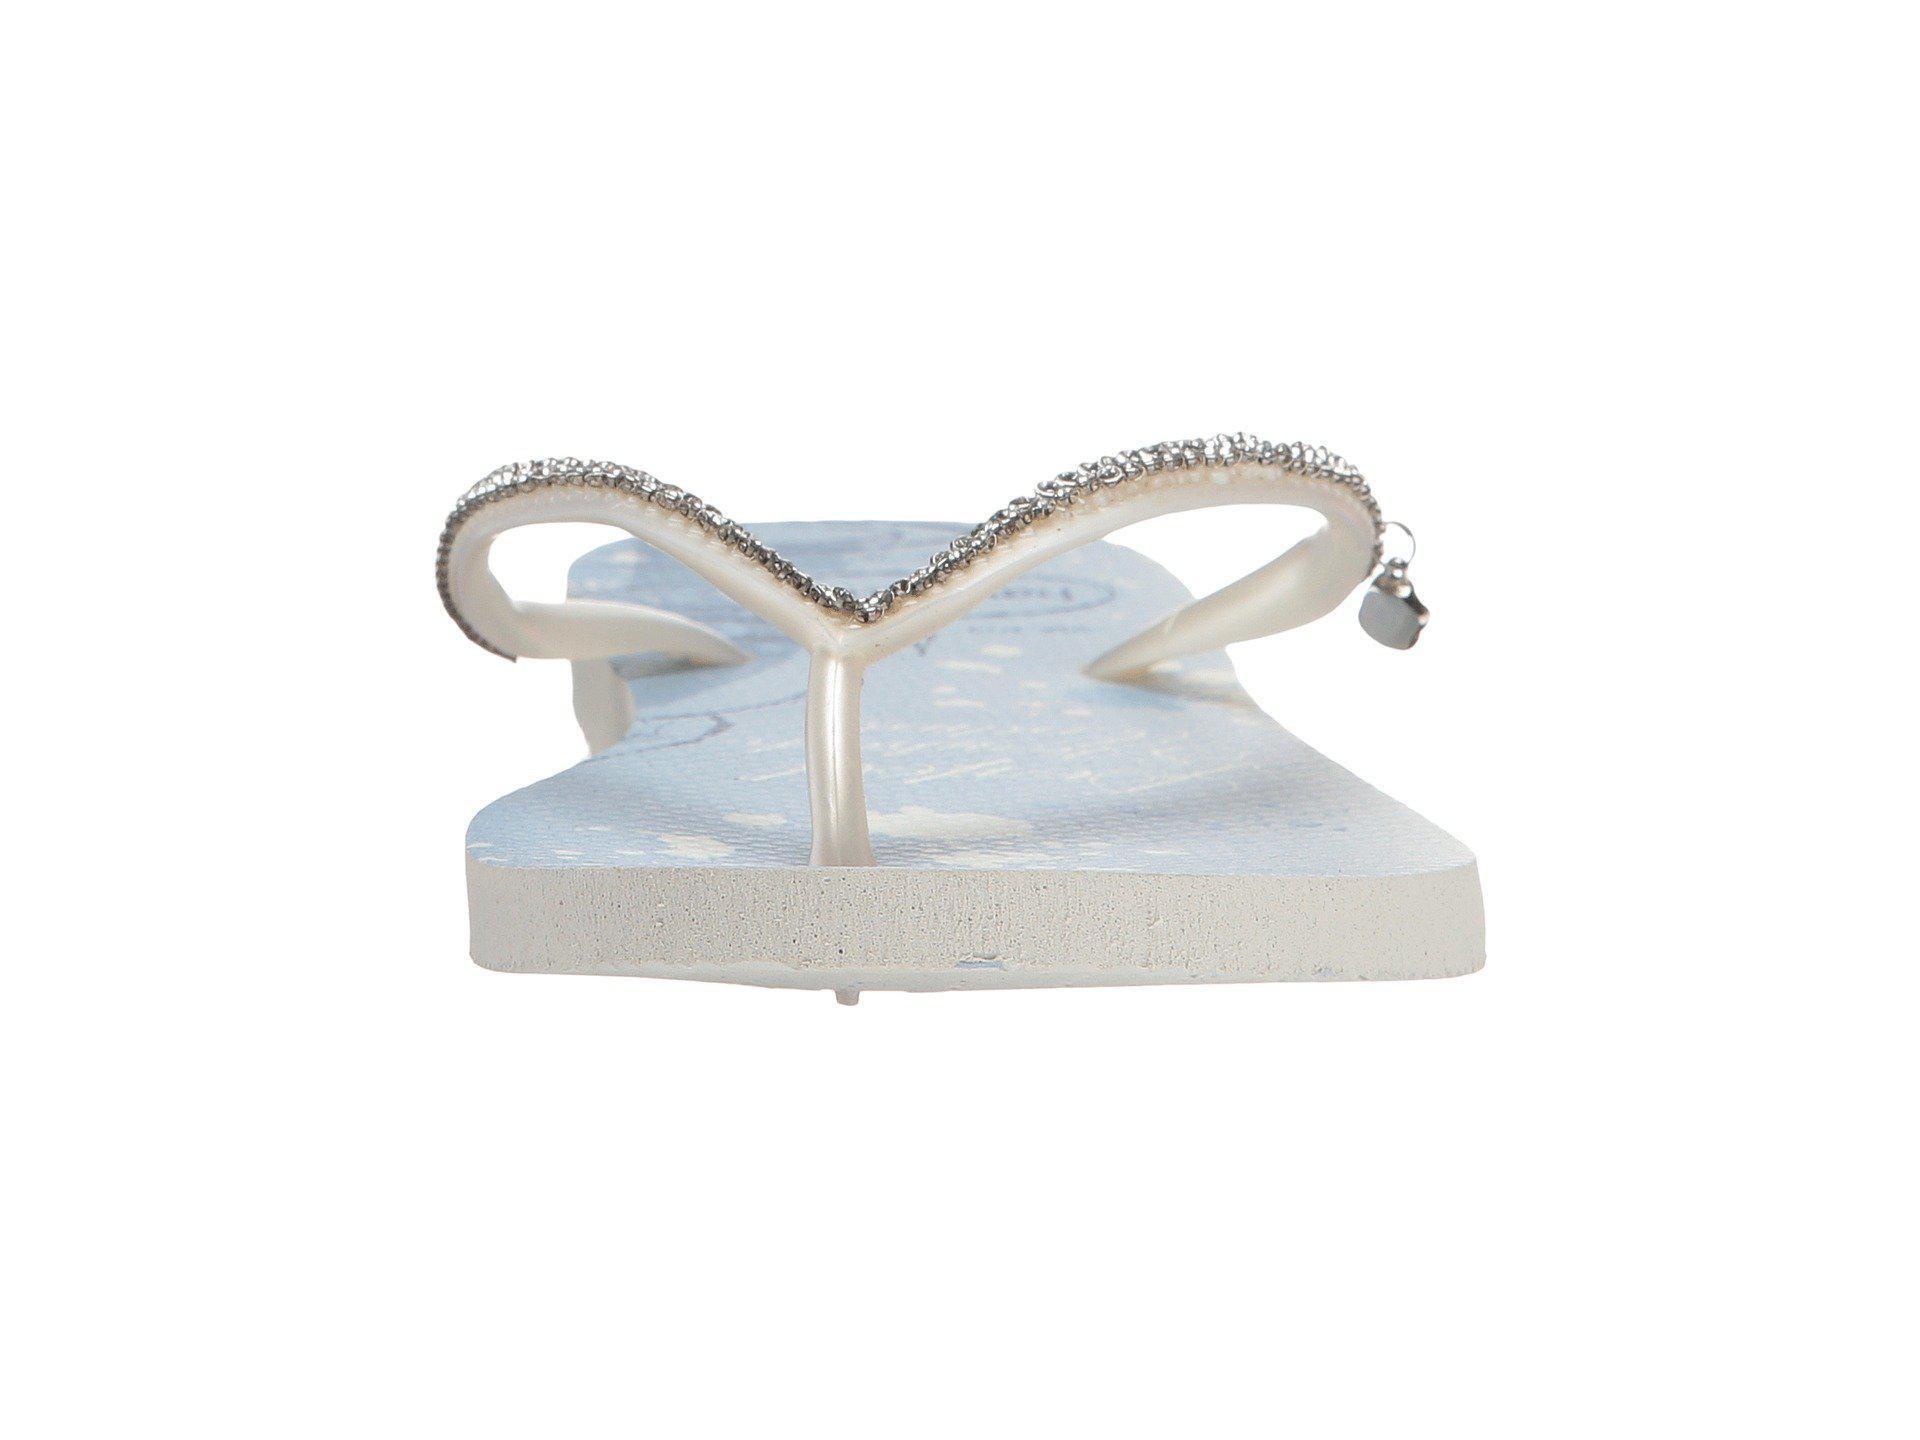 73c9d6090 Lyst - Havaianas Slim Bridal Belle Sandal in White